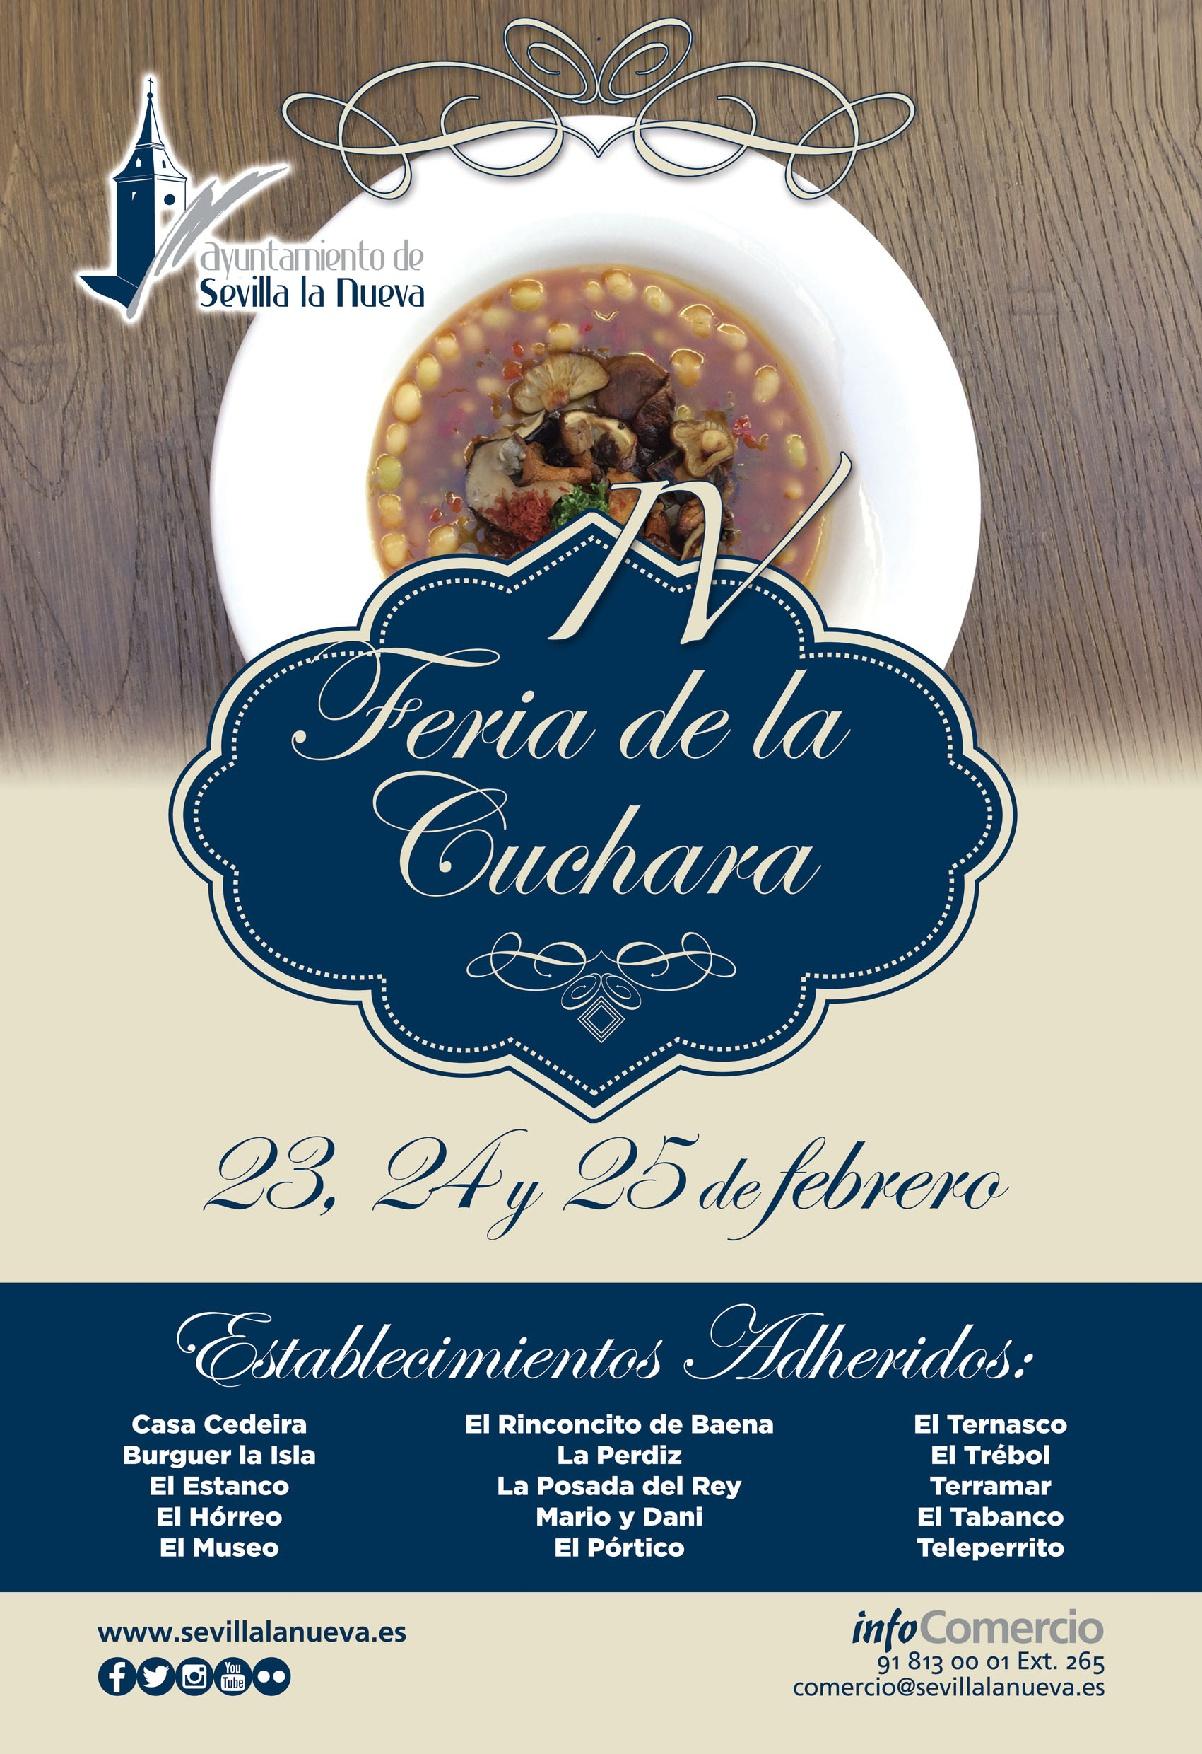 IV Feria de la Cuchara @ Sevilla la Nueva